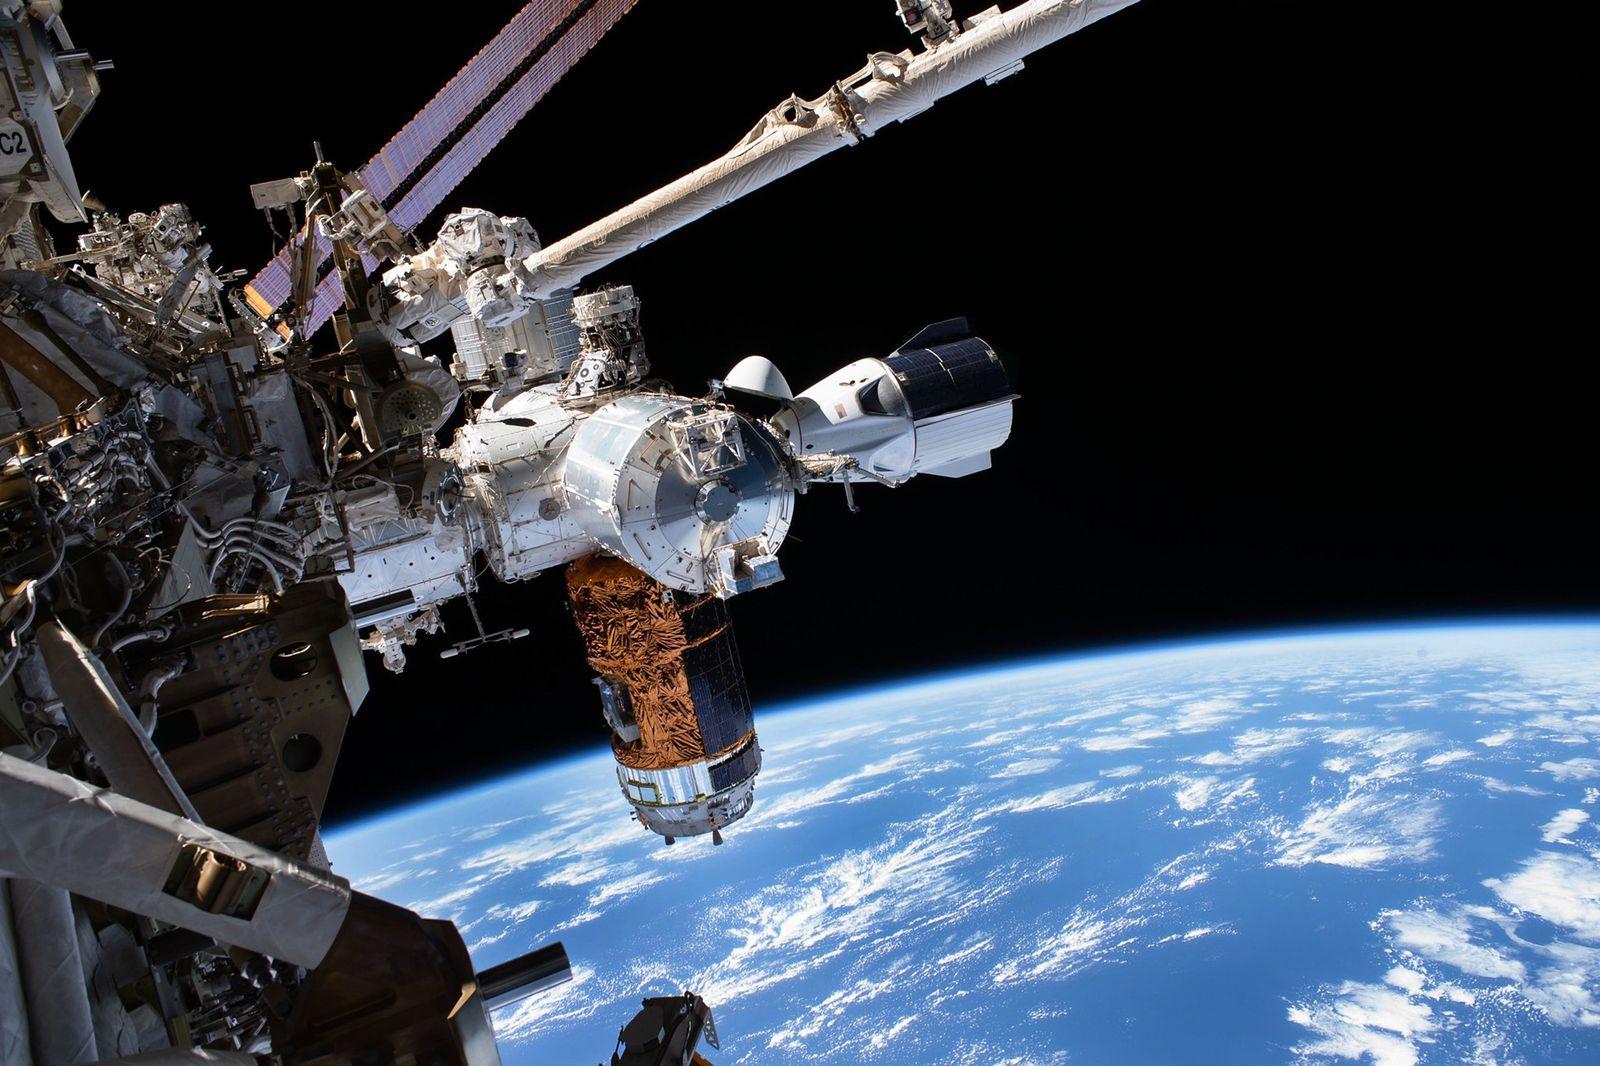 spacex crew dragon first trip spacecraft docking iss jpg?w=1600.'